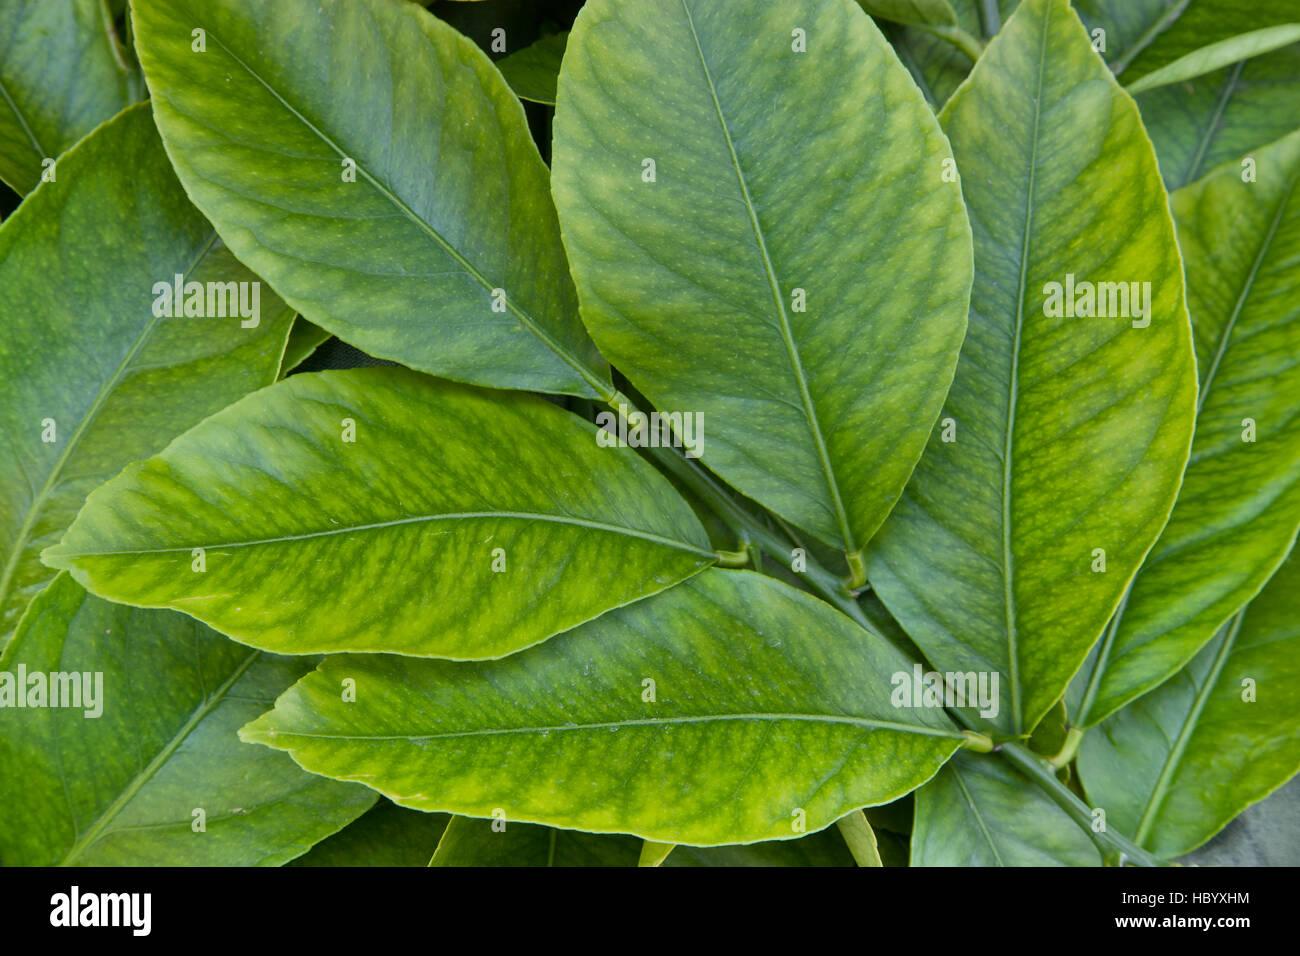 Junge Zitrone Blätter, Zweig 'Citrus Limon'. Stockbild